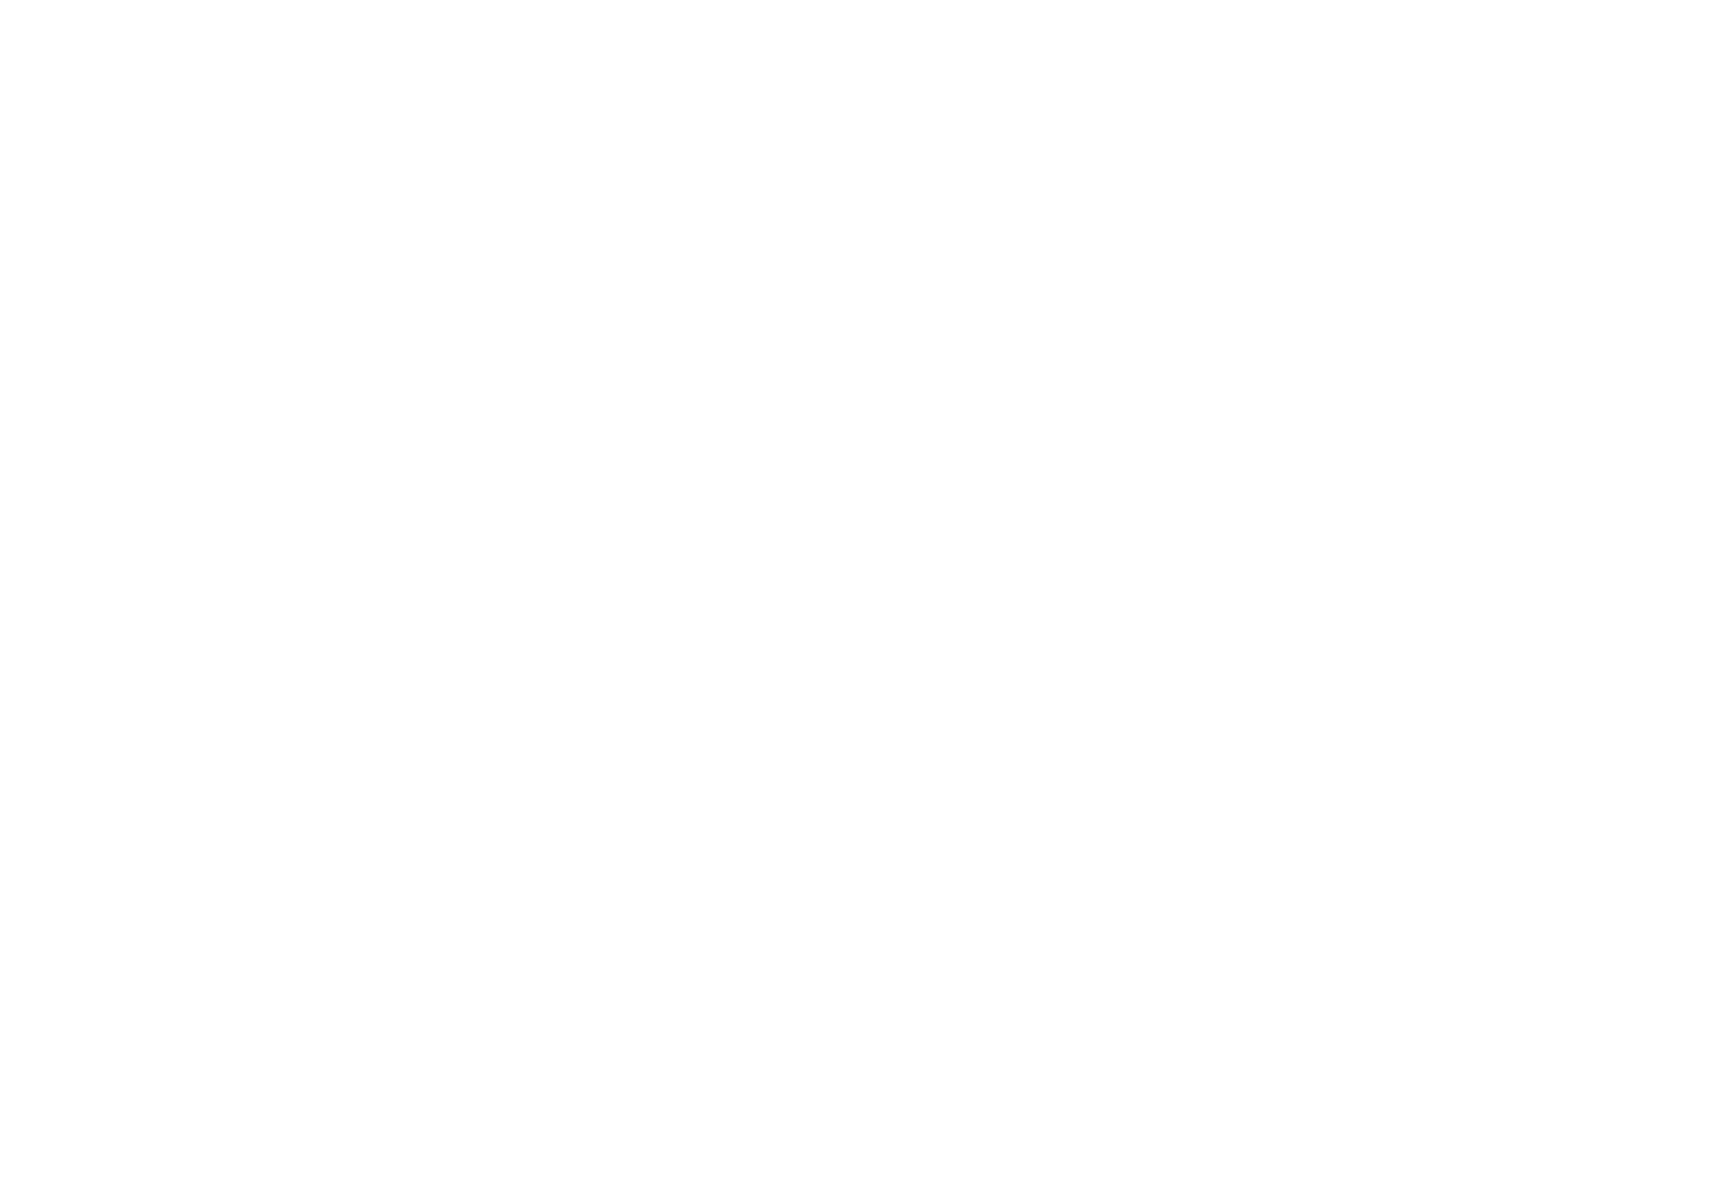 2020.8/8-9|Mr. DEEP POCKET × ACCALMIE Laurent STEPHAN|at PHAETON